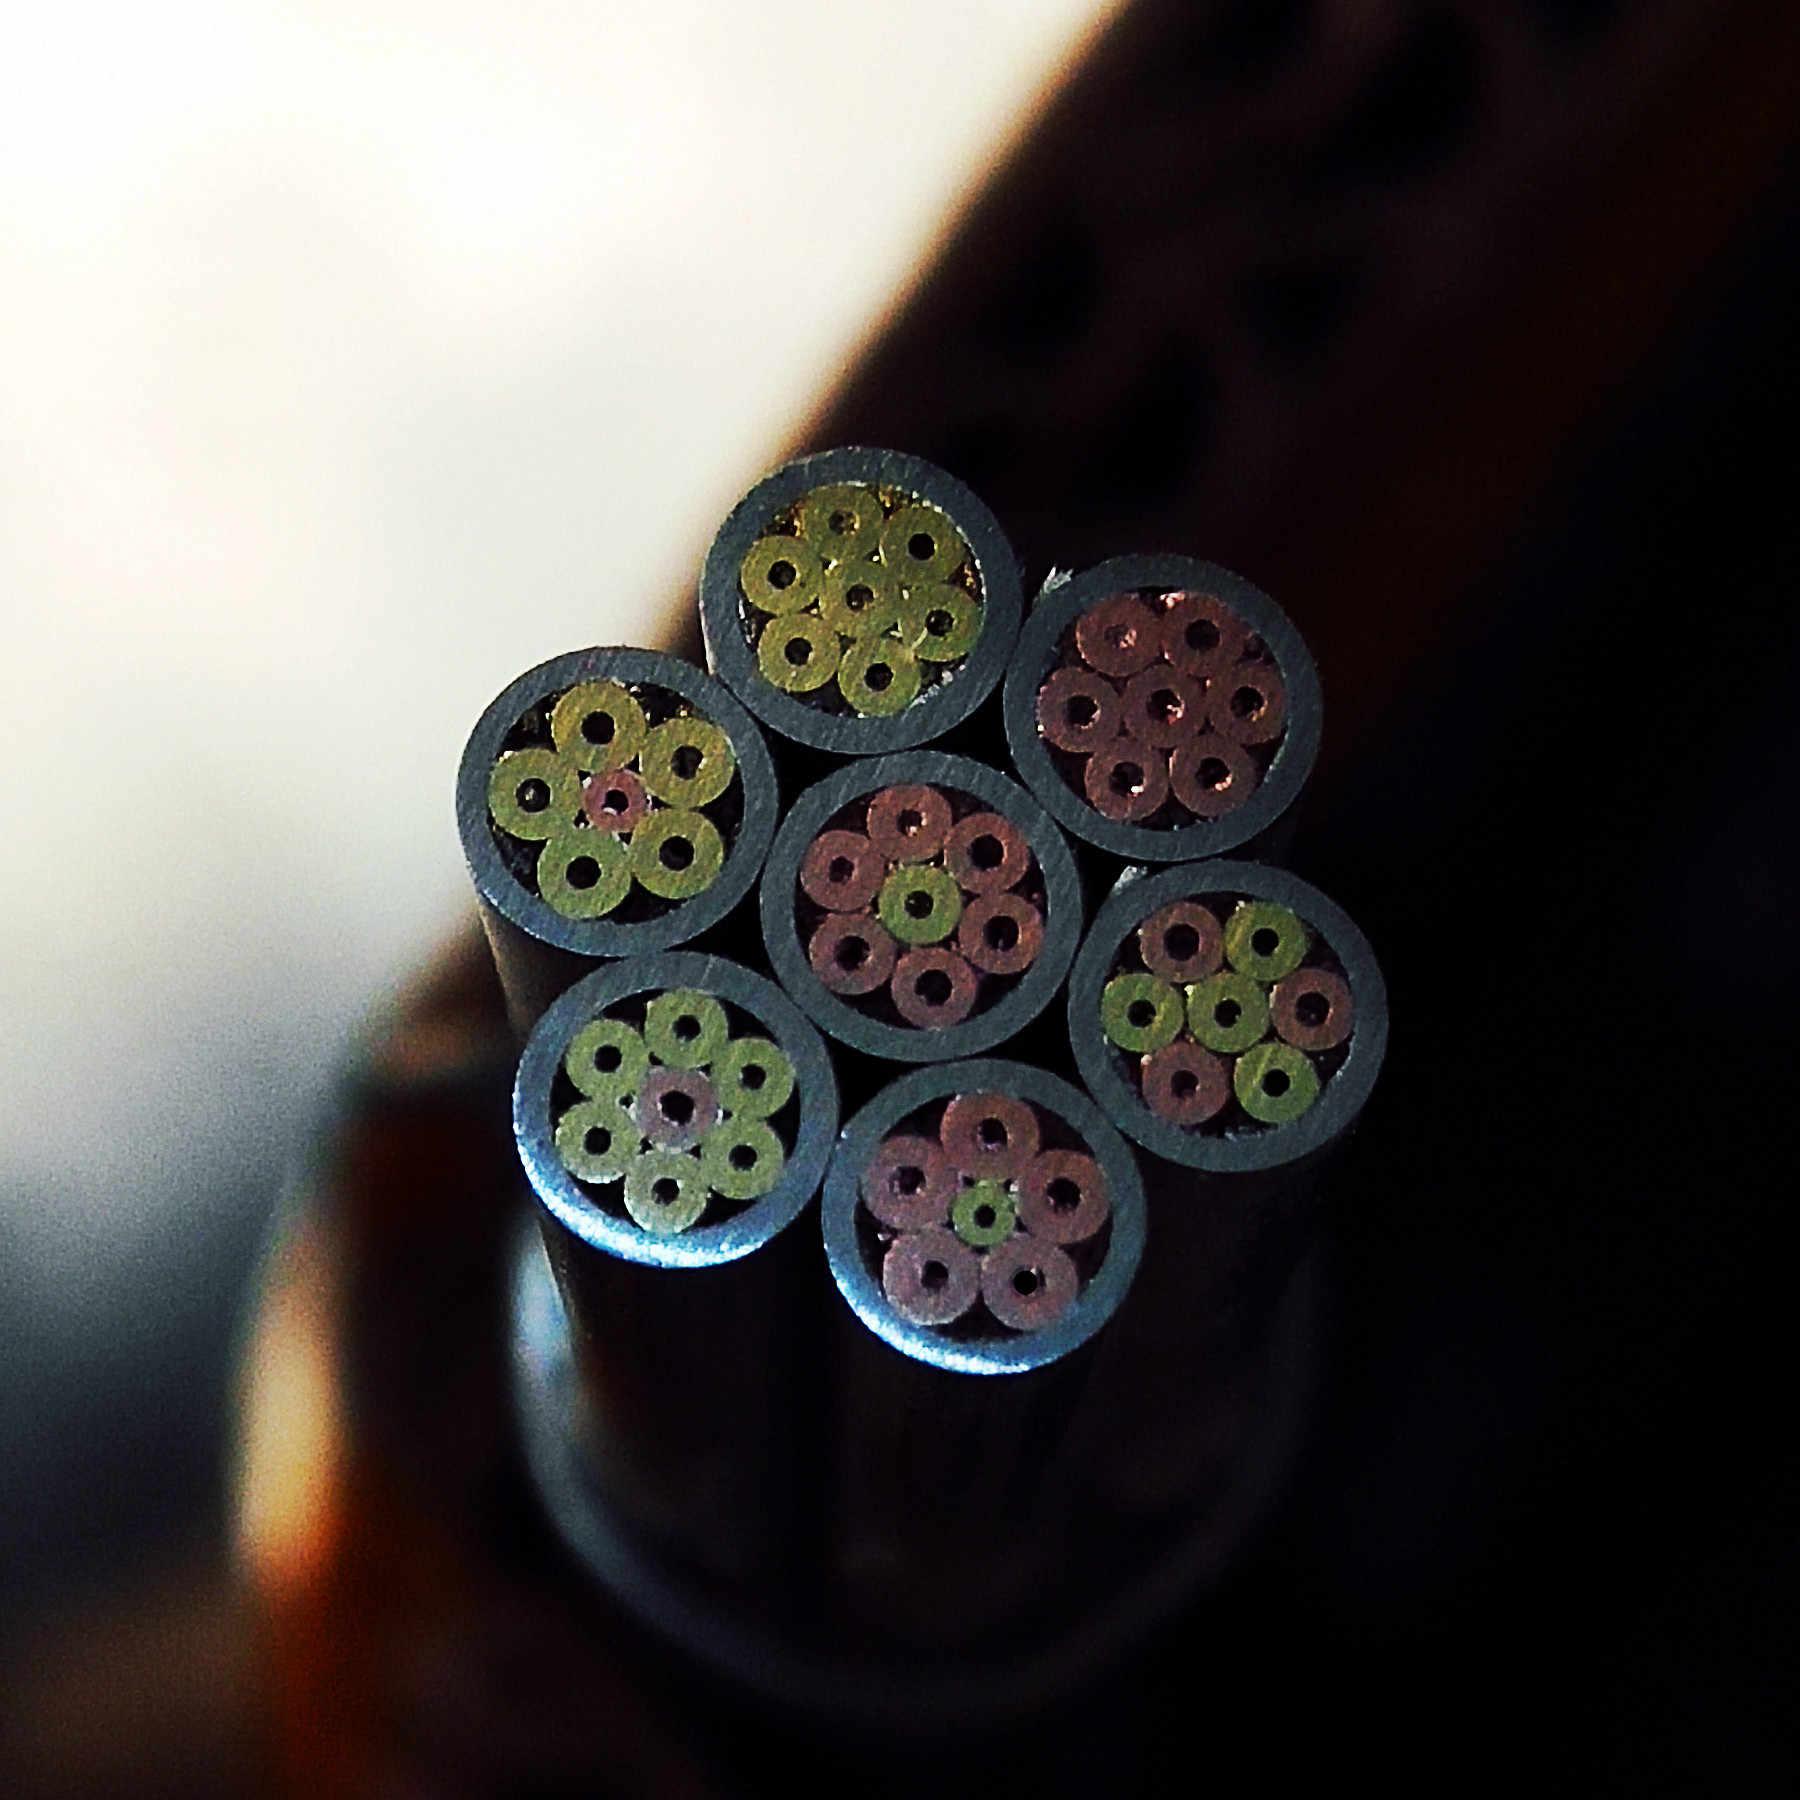 4mm mosaic keling Pisau menangani sekrup Kacang kuningan tembaga merah tembaga Pin nail diy EDC